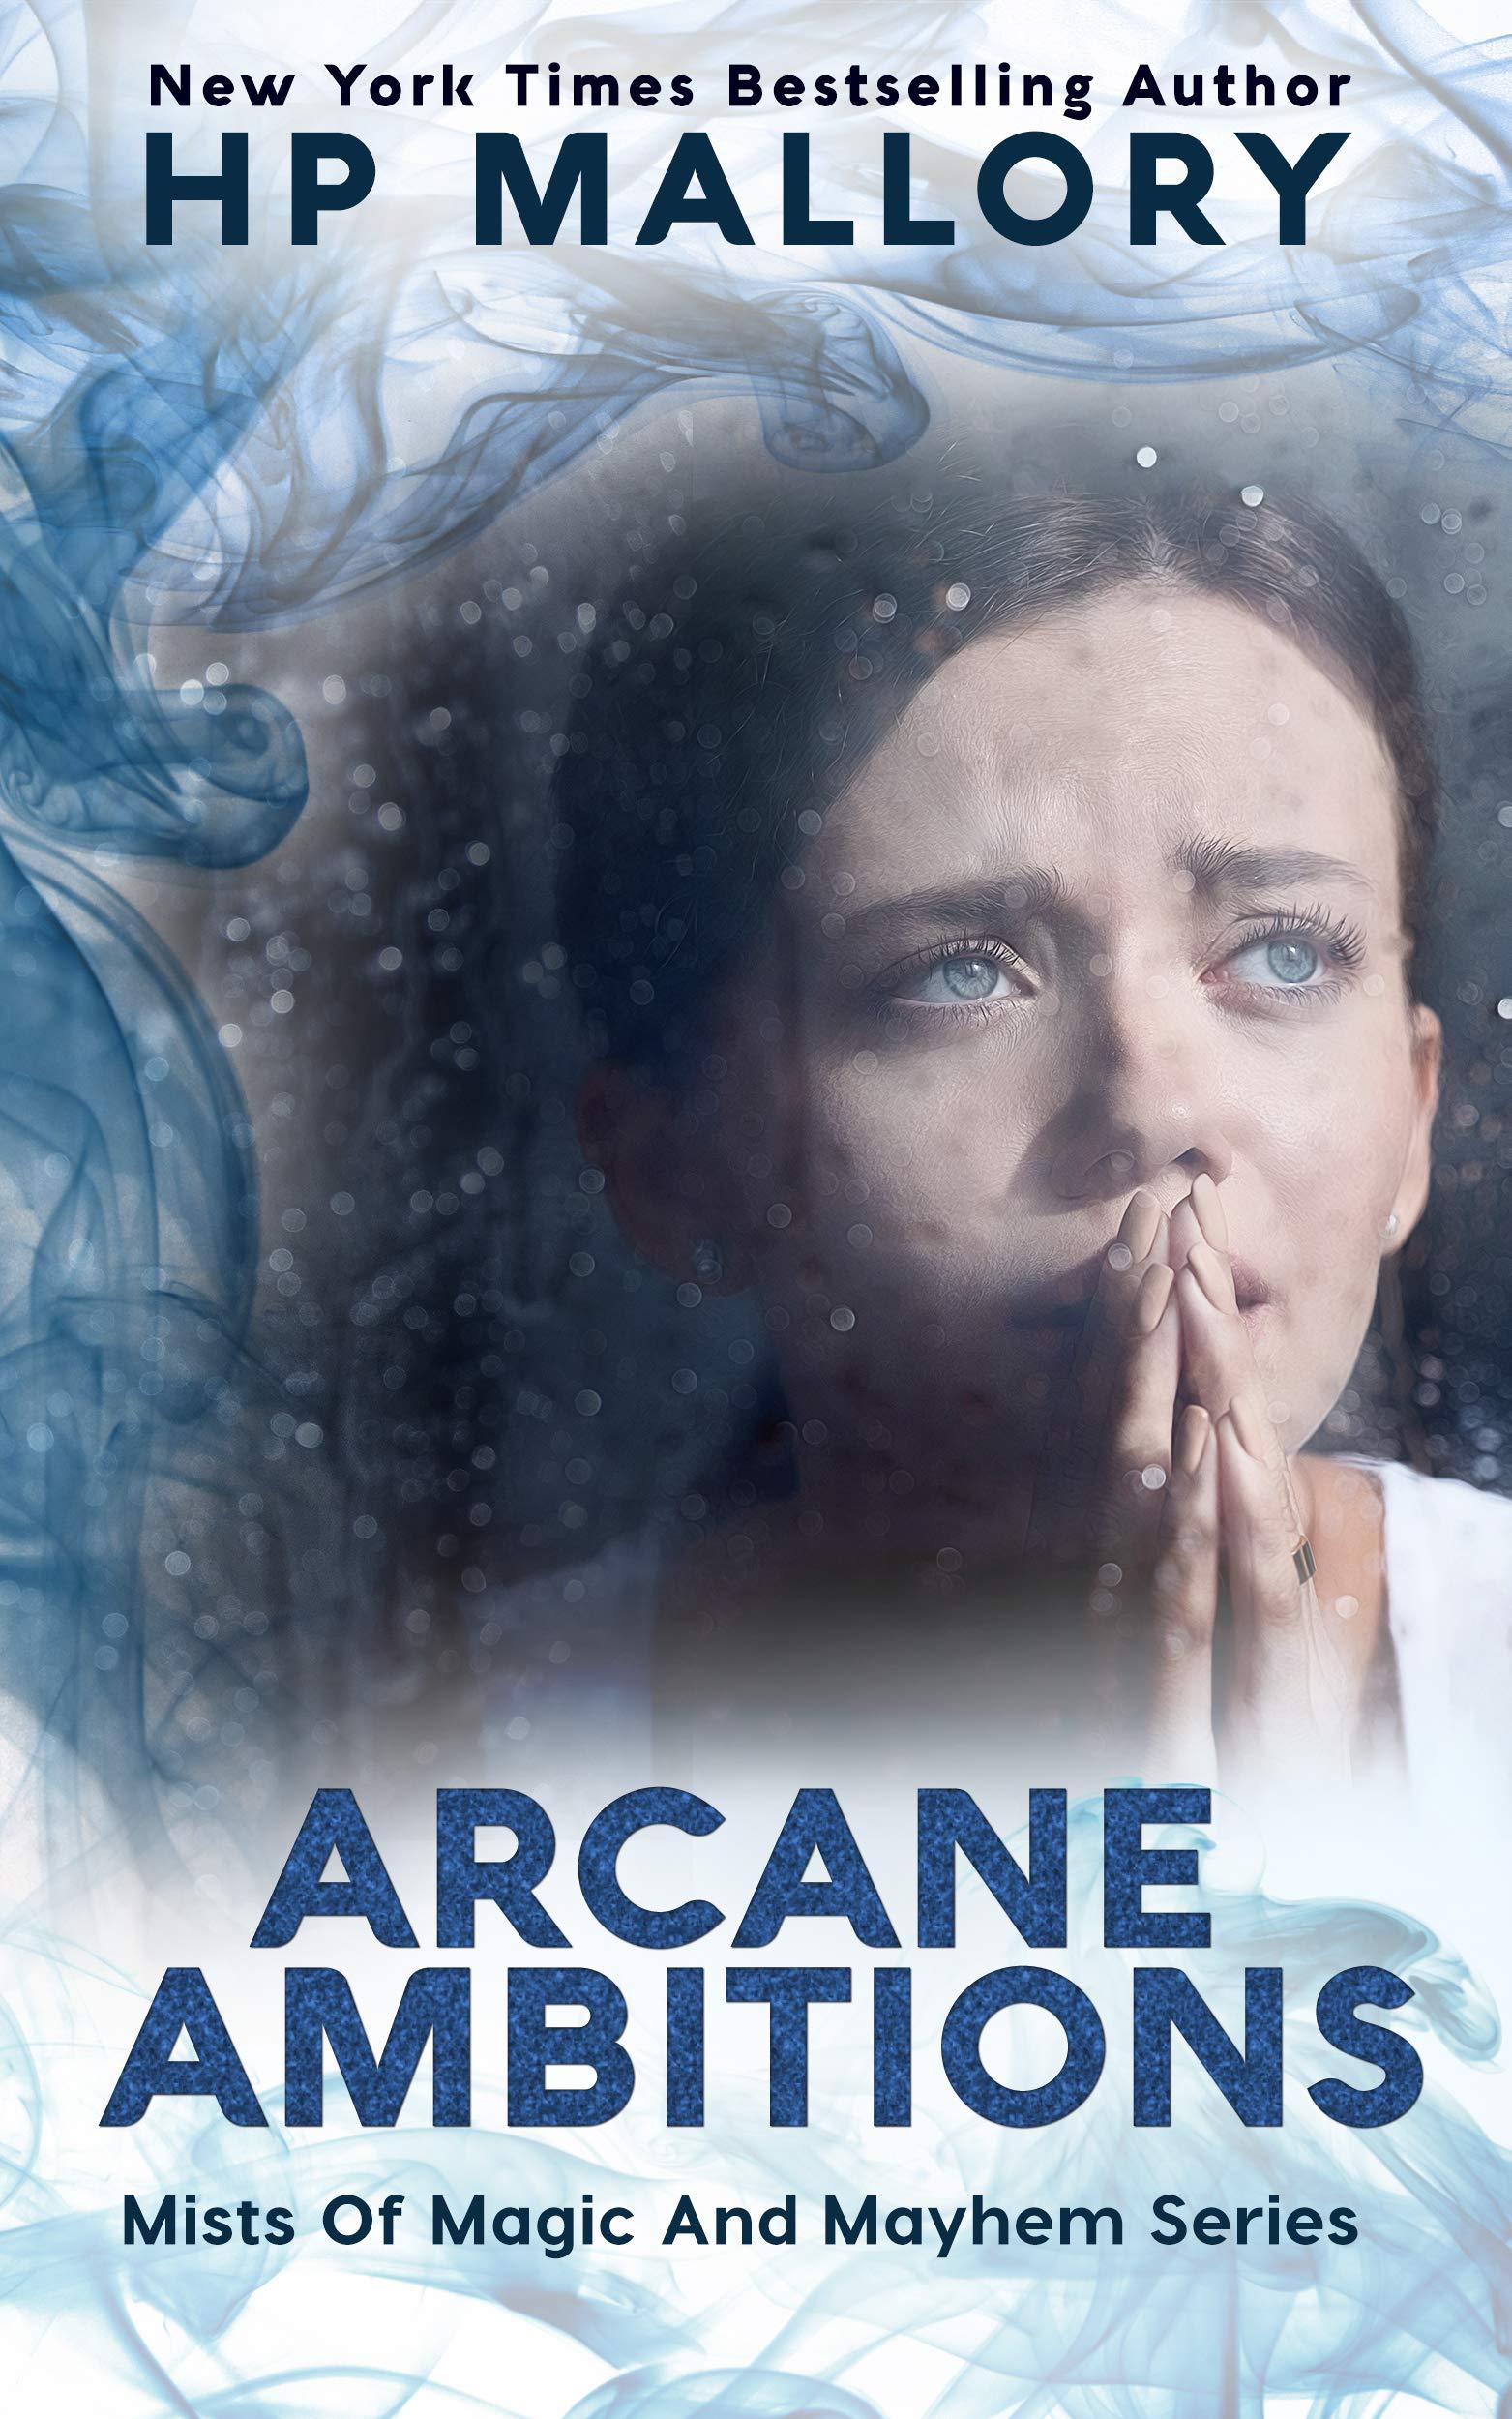 Arcane Ambitions (Mists of Magic and Mayhem, #5)